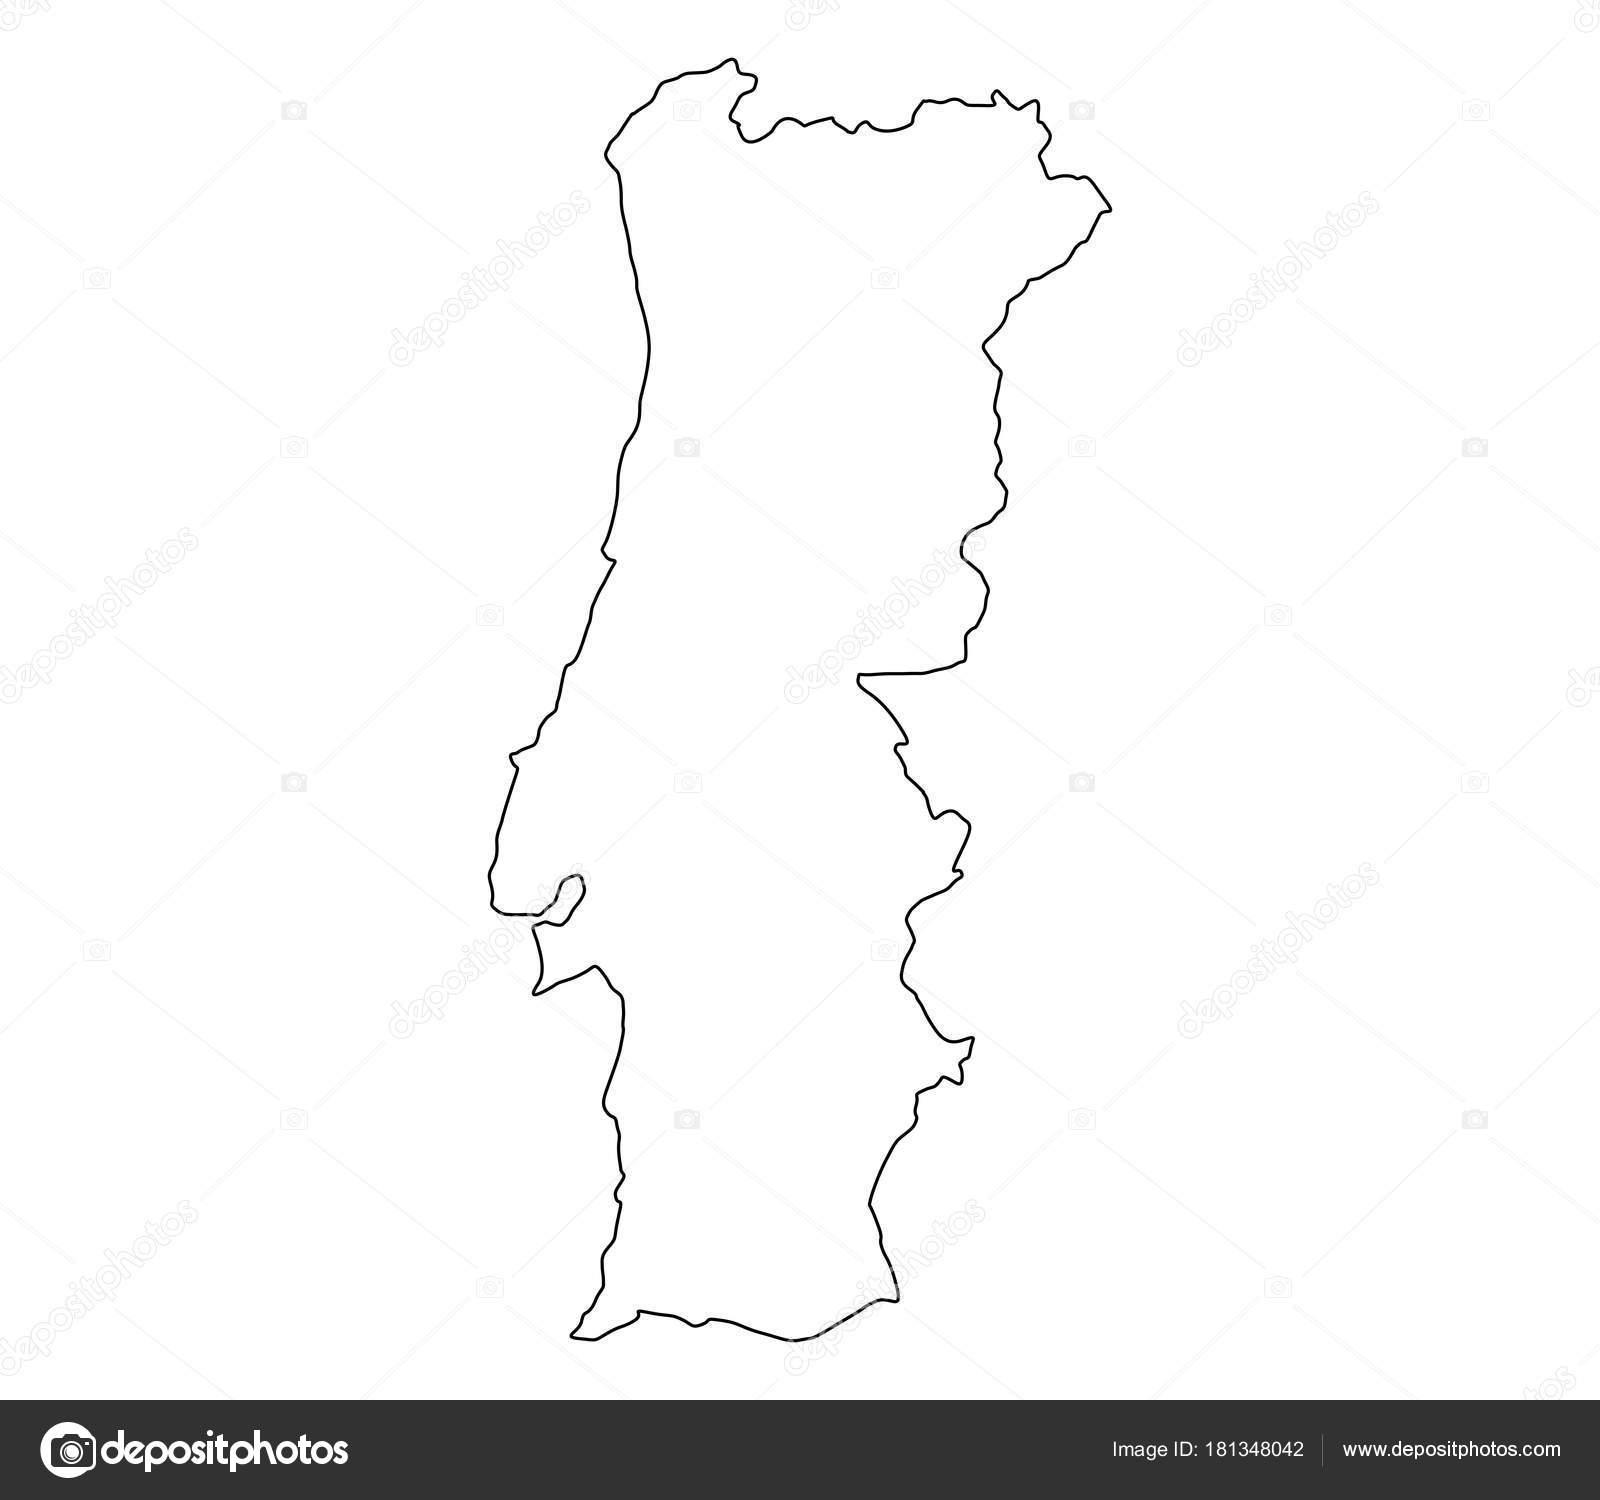 mapa de portugal branco Mapa Portugal Sobre Fundo Branco — Vetor de Stock © marcotrapani  mapa de portugal branco